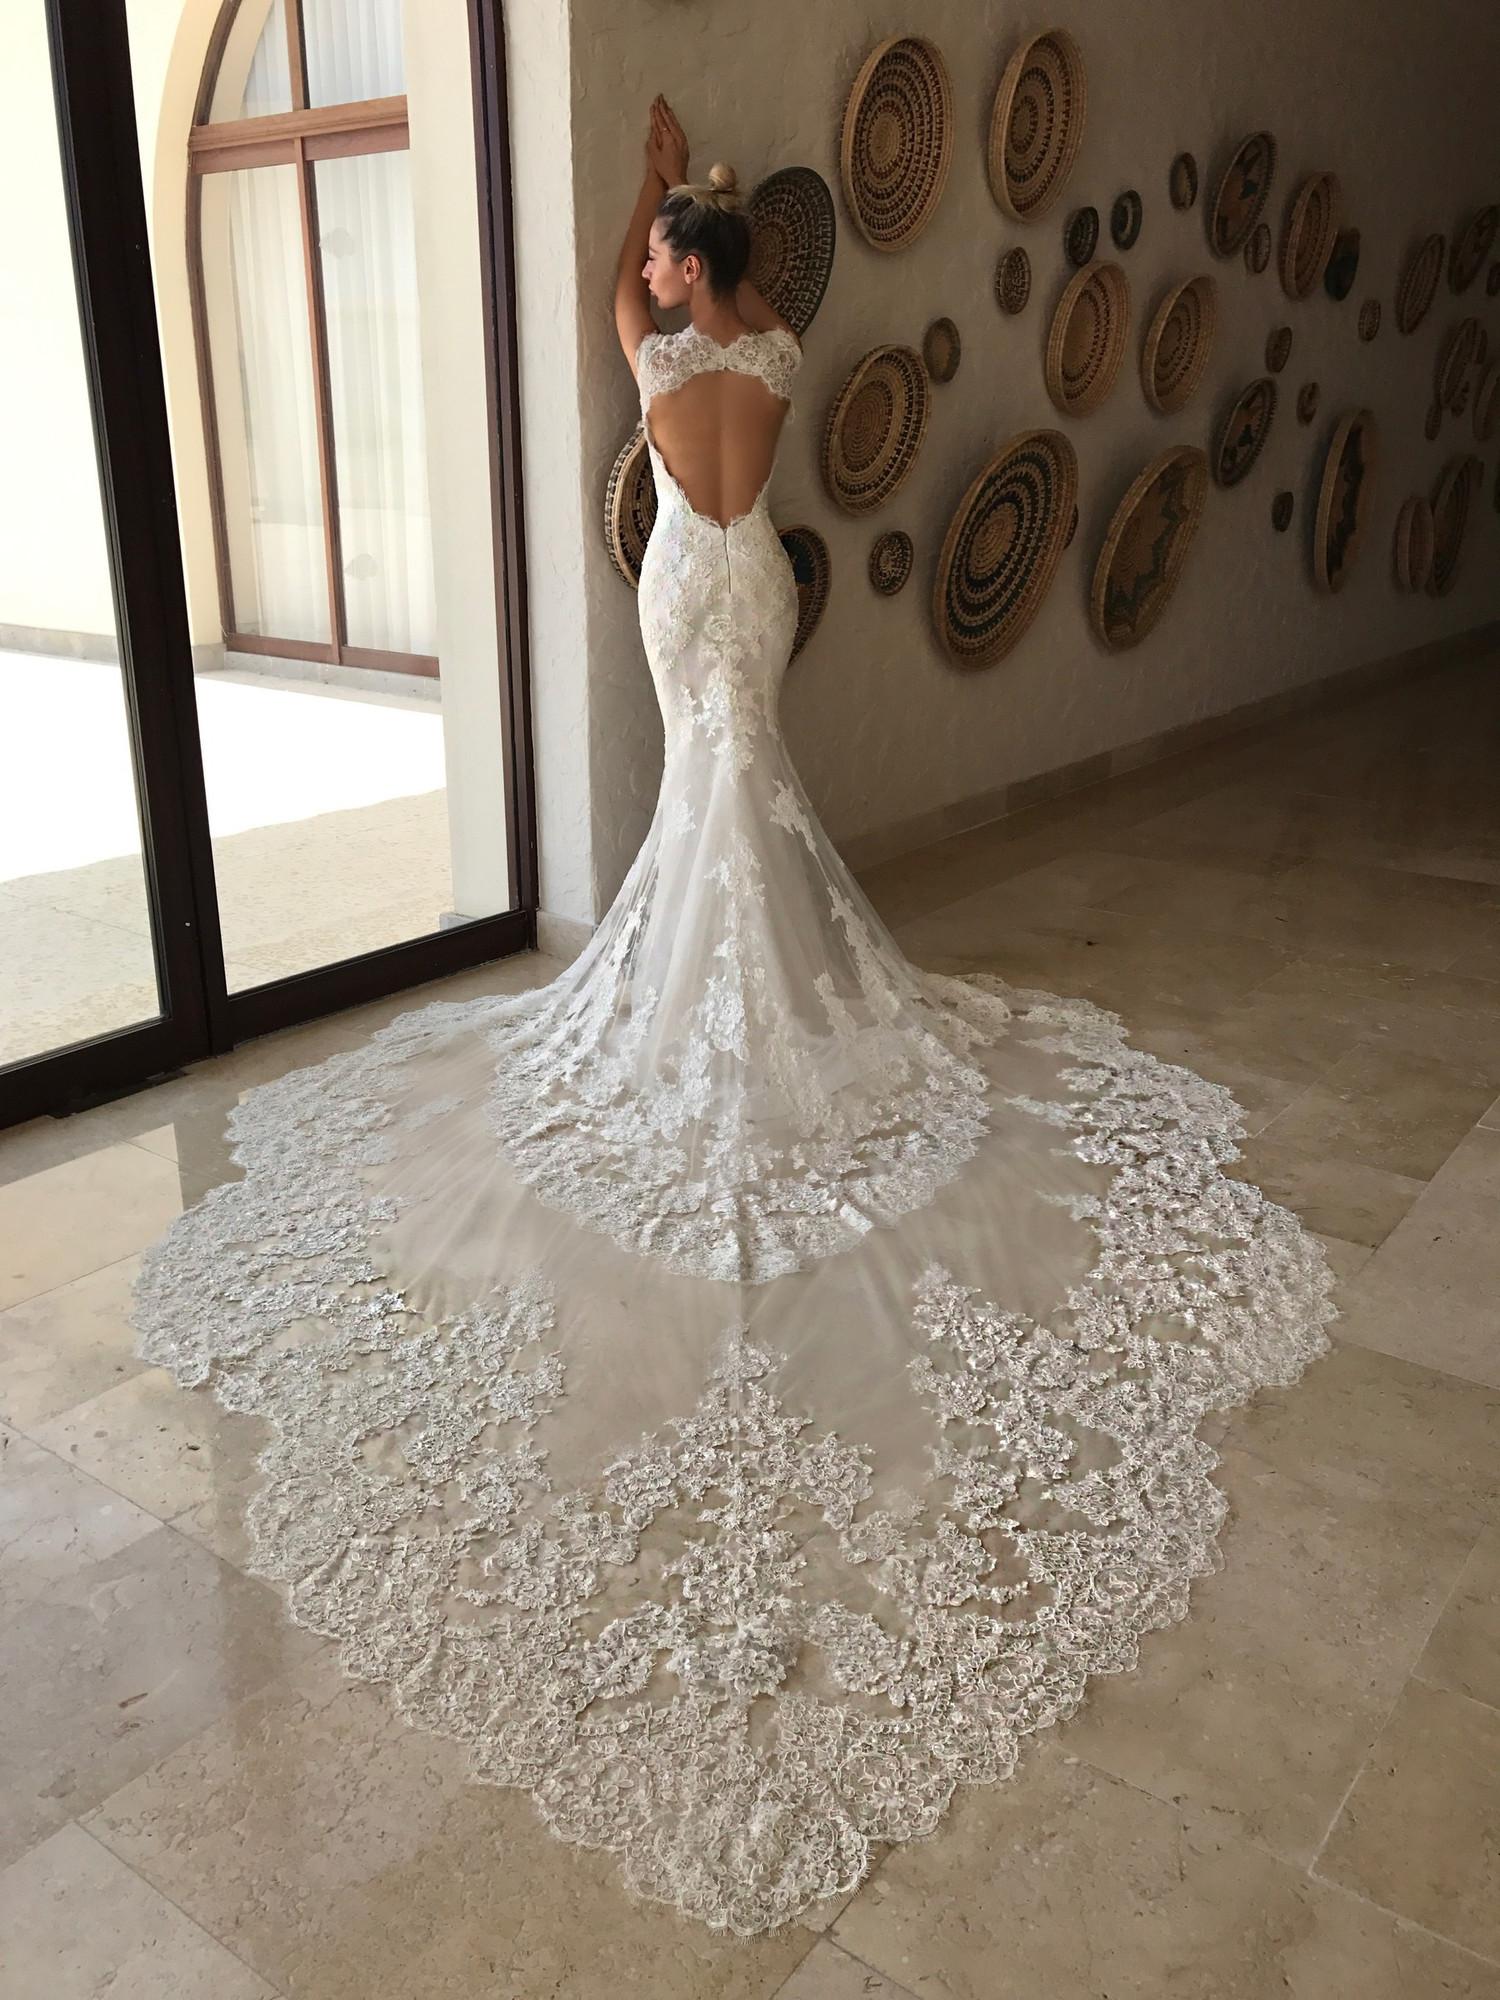 Mermaid Wedding Dress Photos, Mermaid Wedding Dress ...